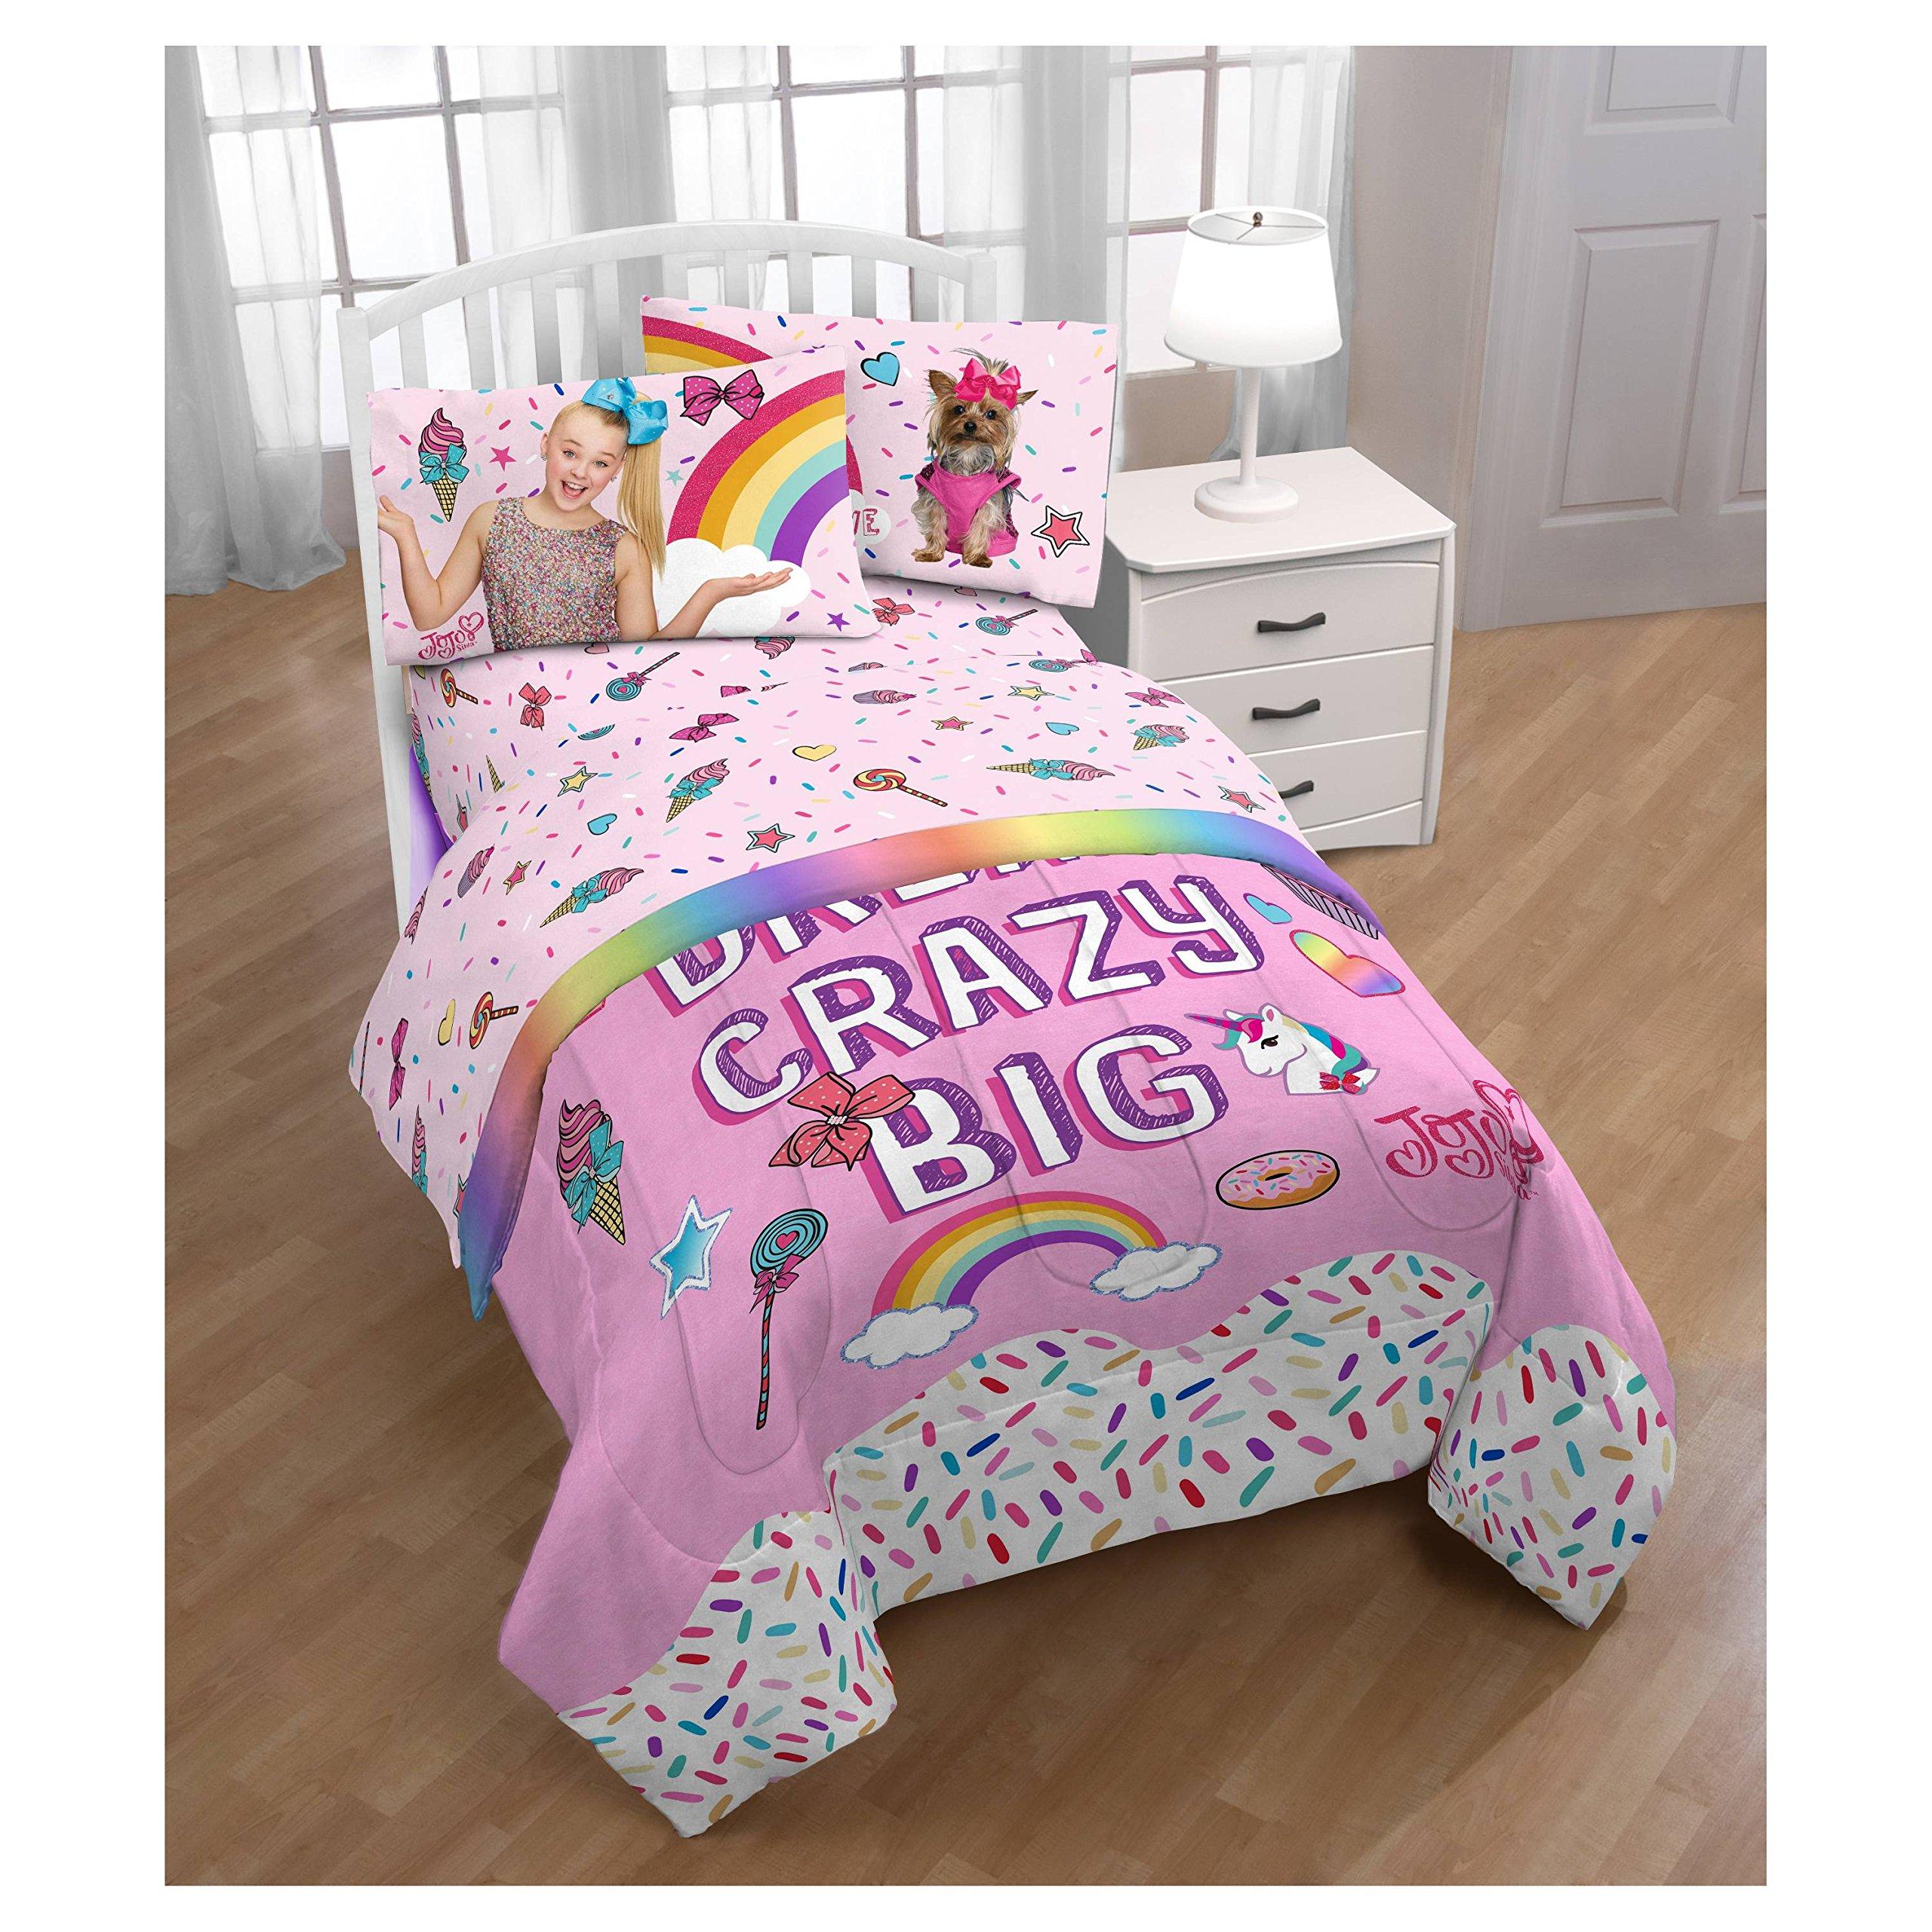 JoJo Siwa Twin Comforter and Pink Sheet Sets with Throw